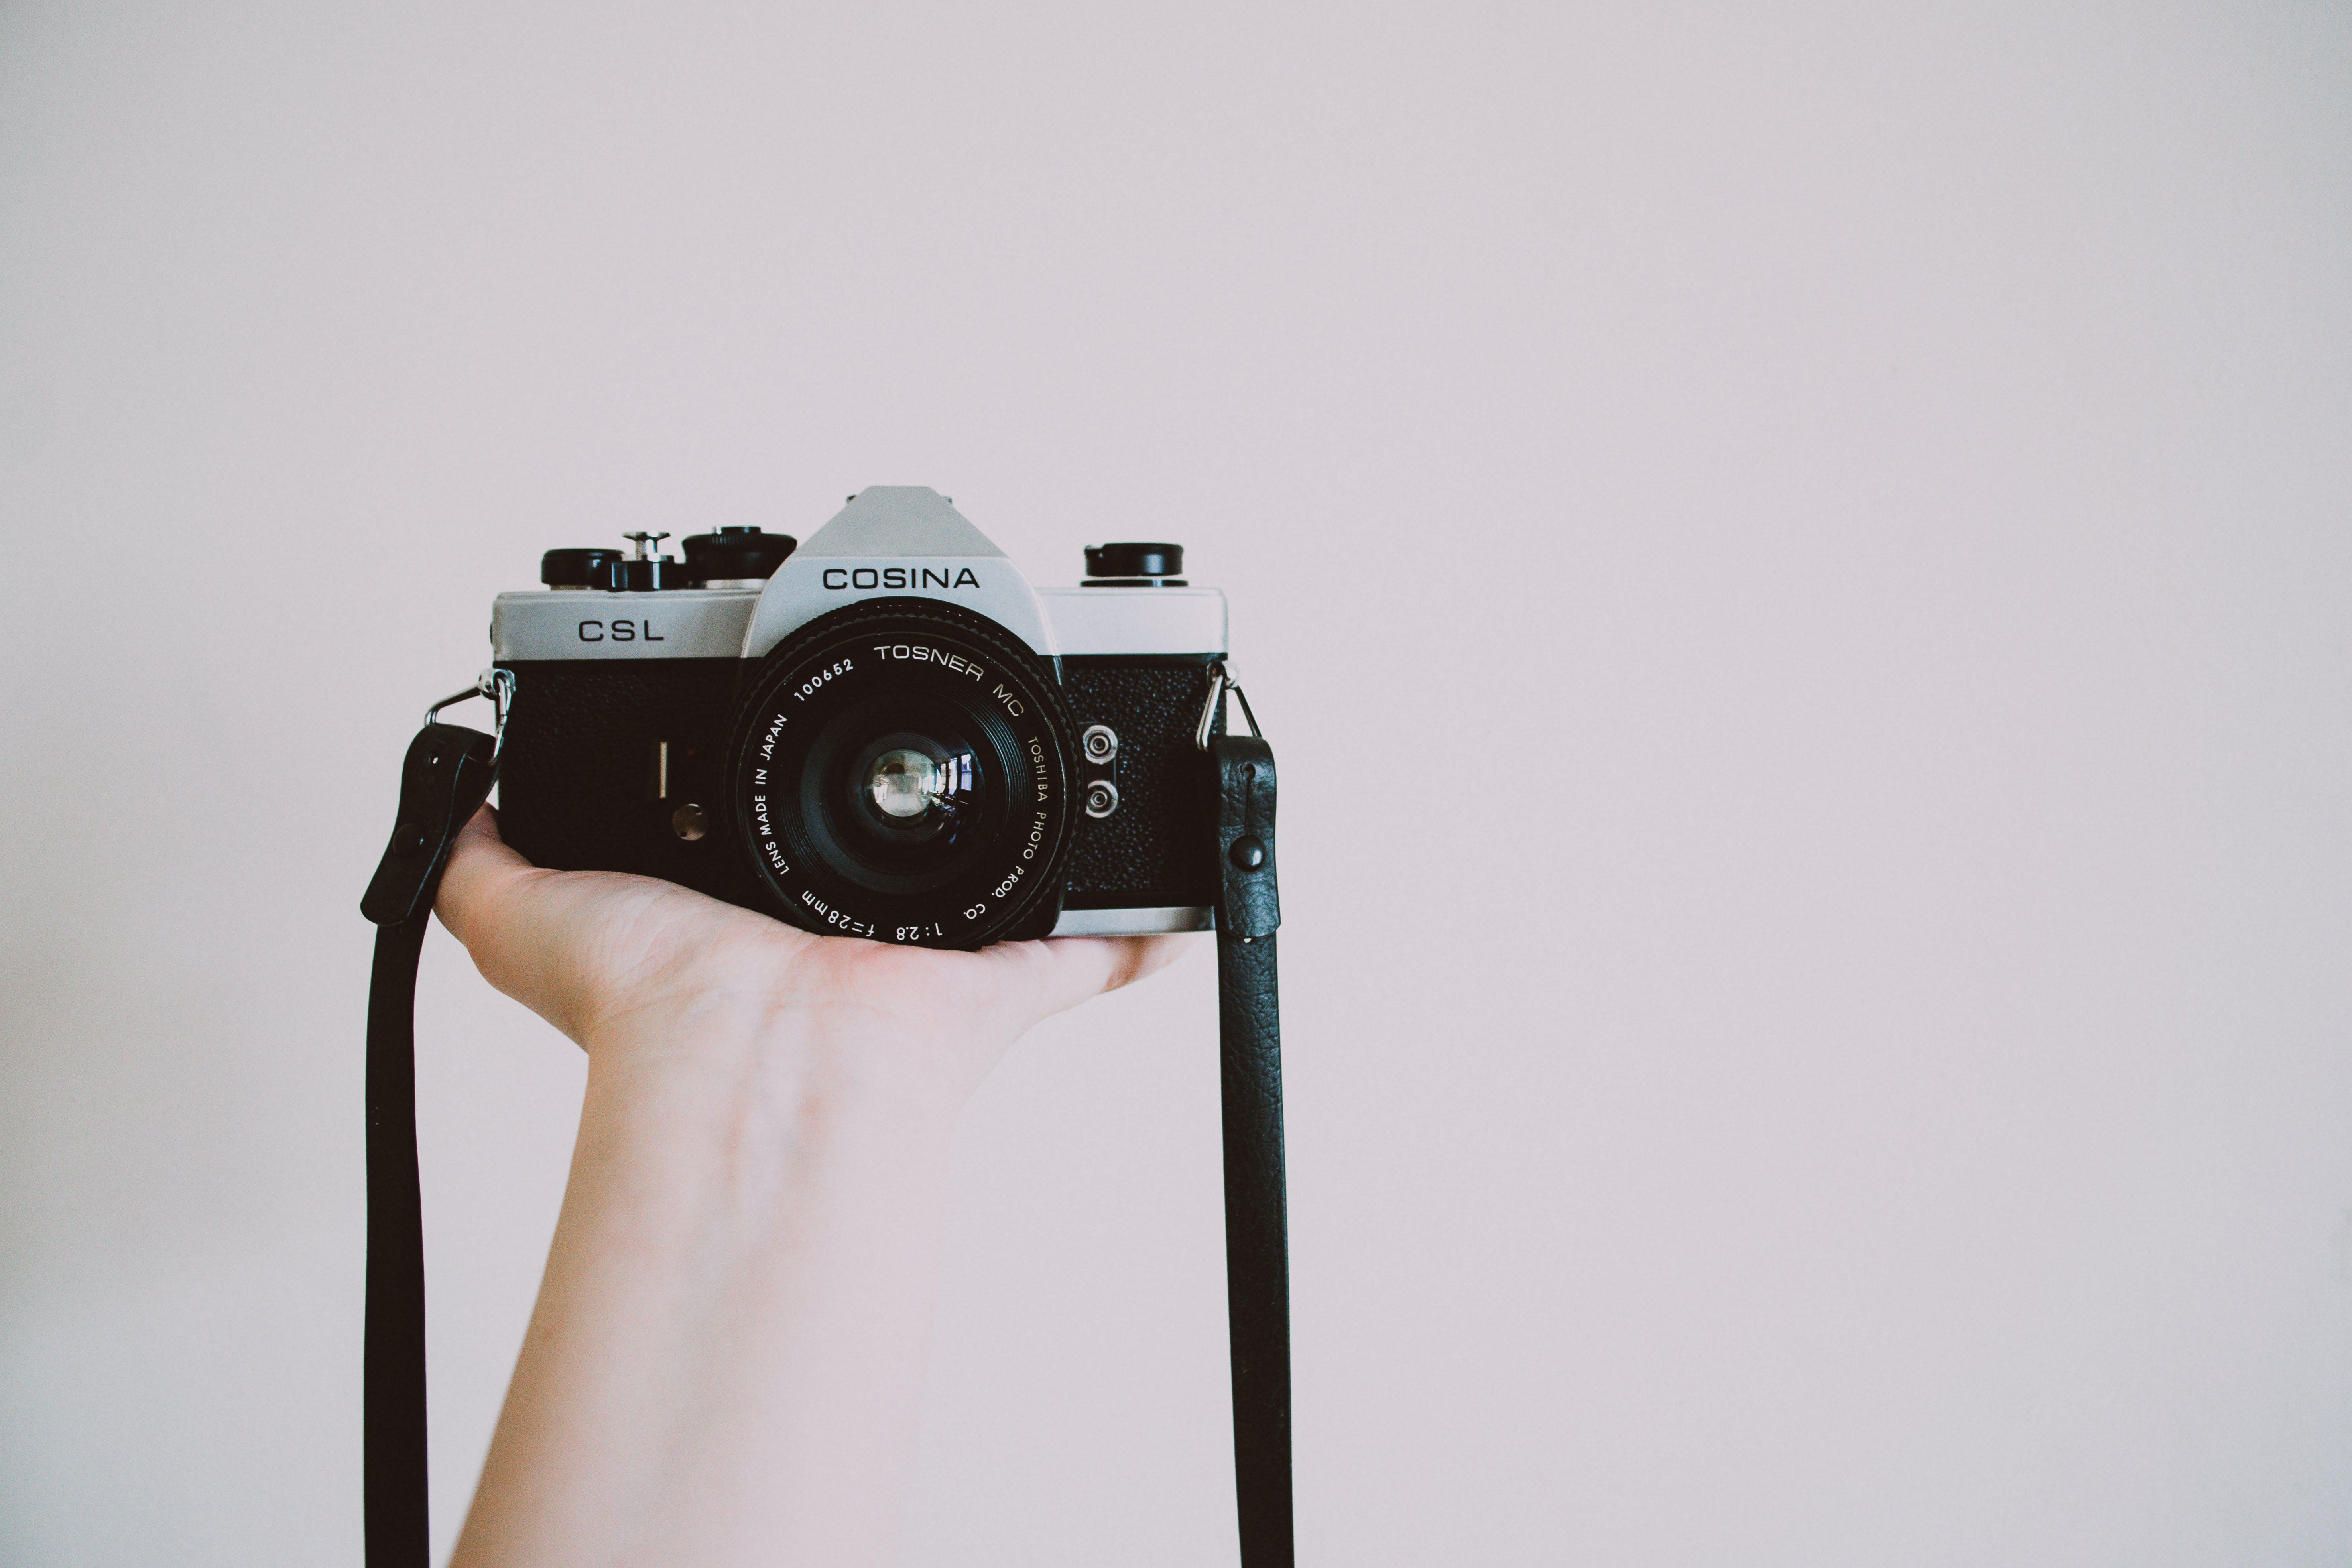 Photography of Person Holding Cosina Camera